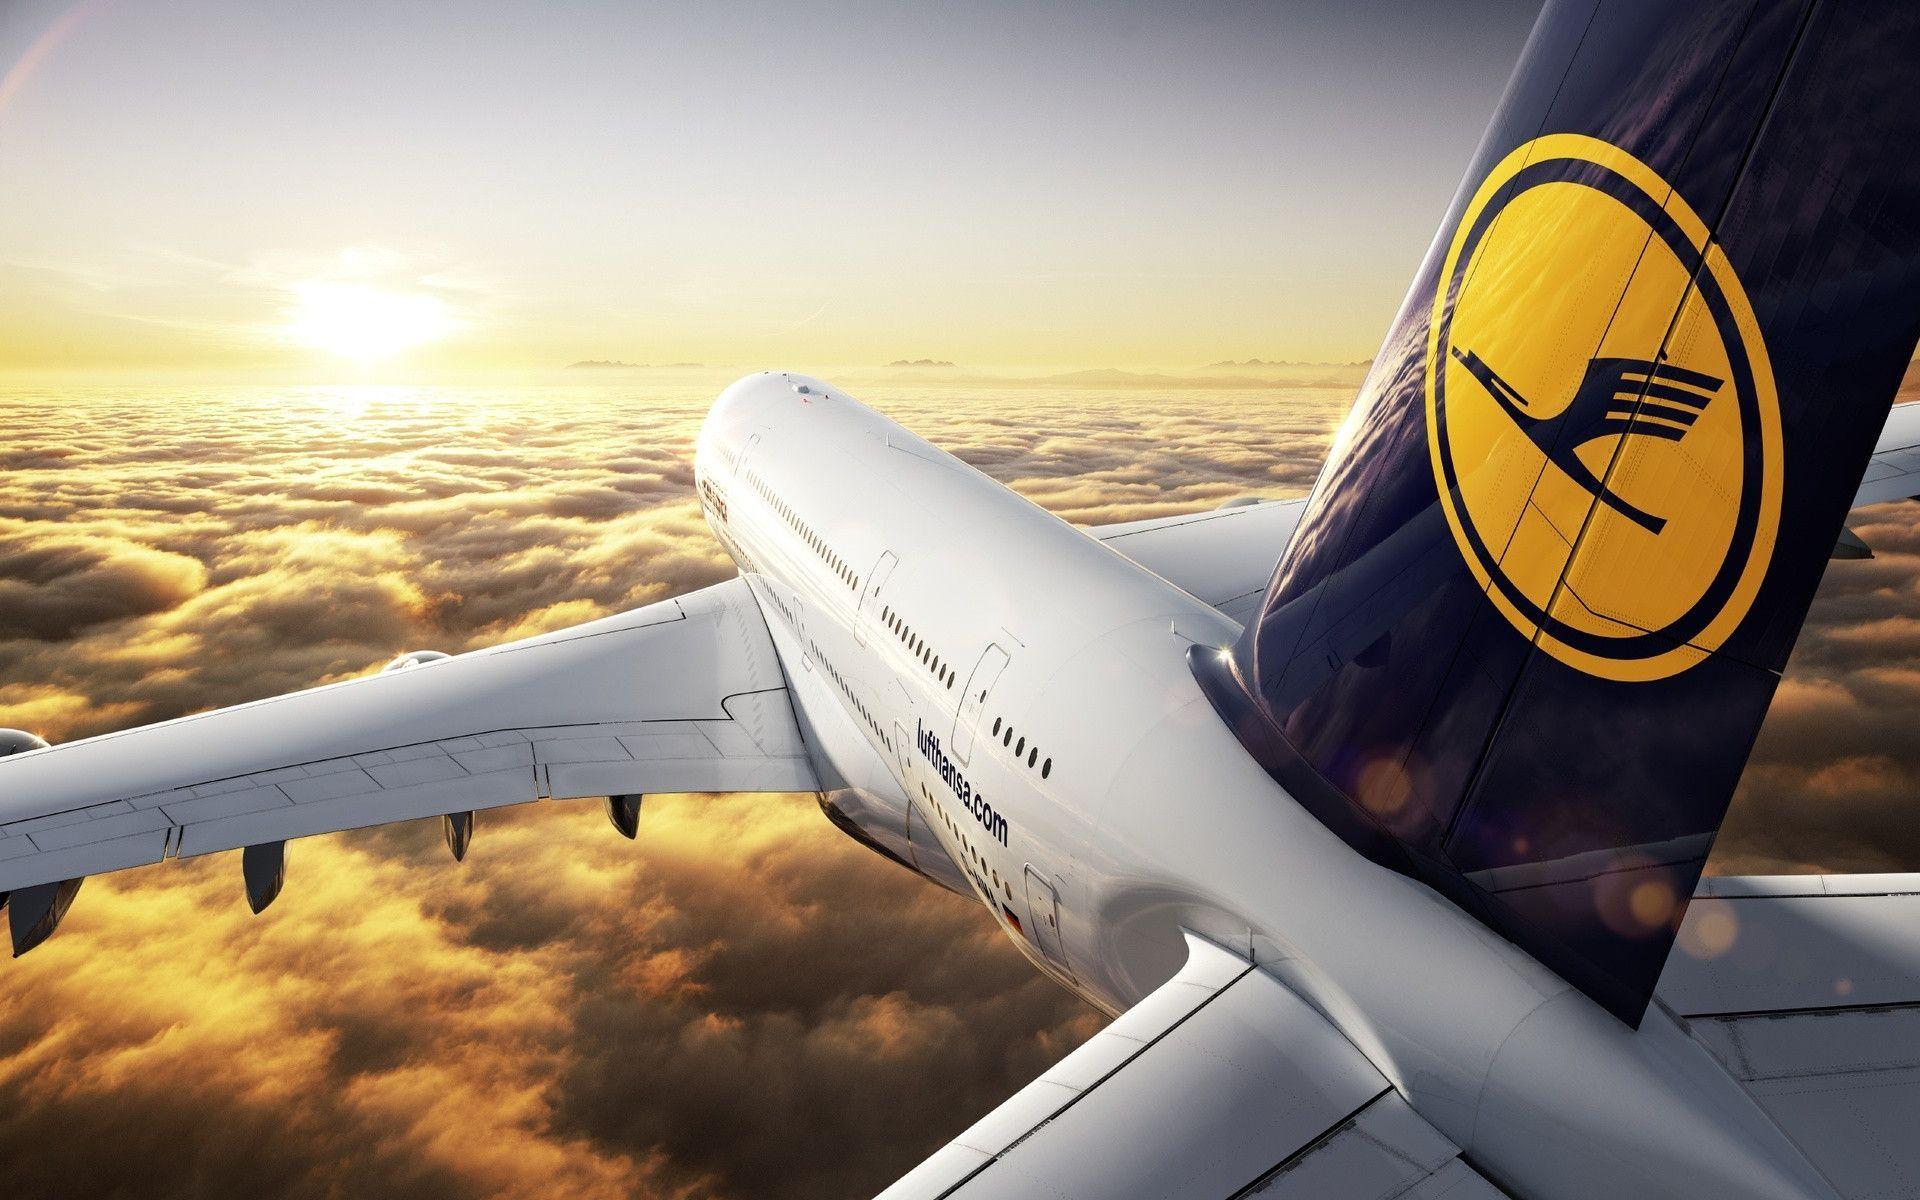 Airplane Wallpaper Wallpapers 4k Pinterest Airplane